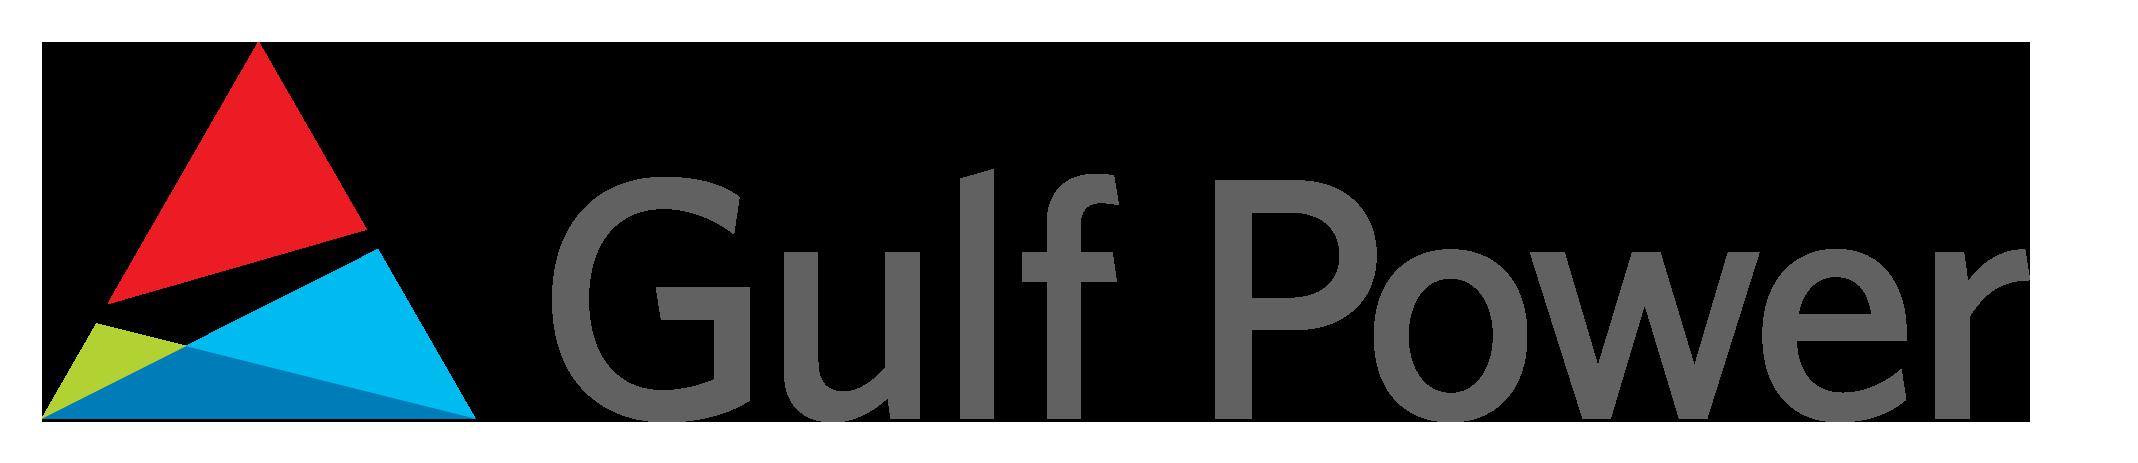 Gulf Power logo (horizontal)